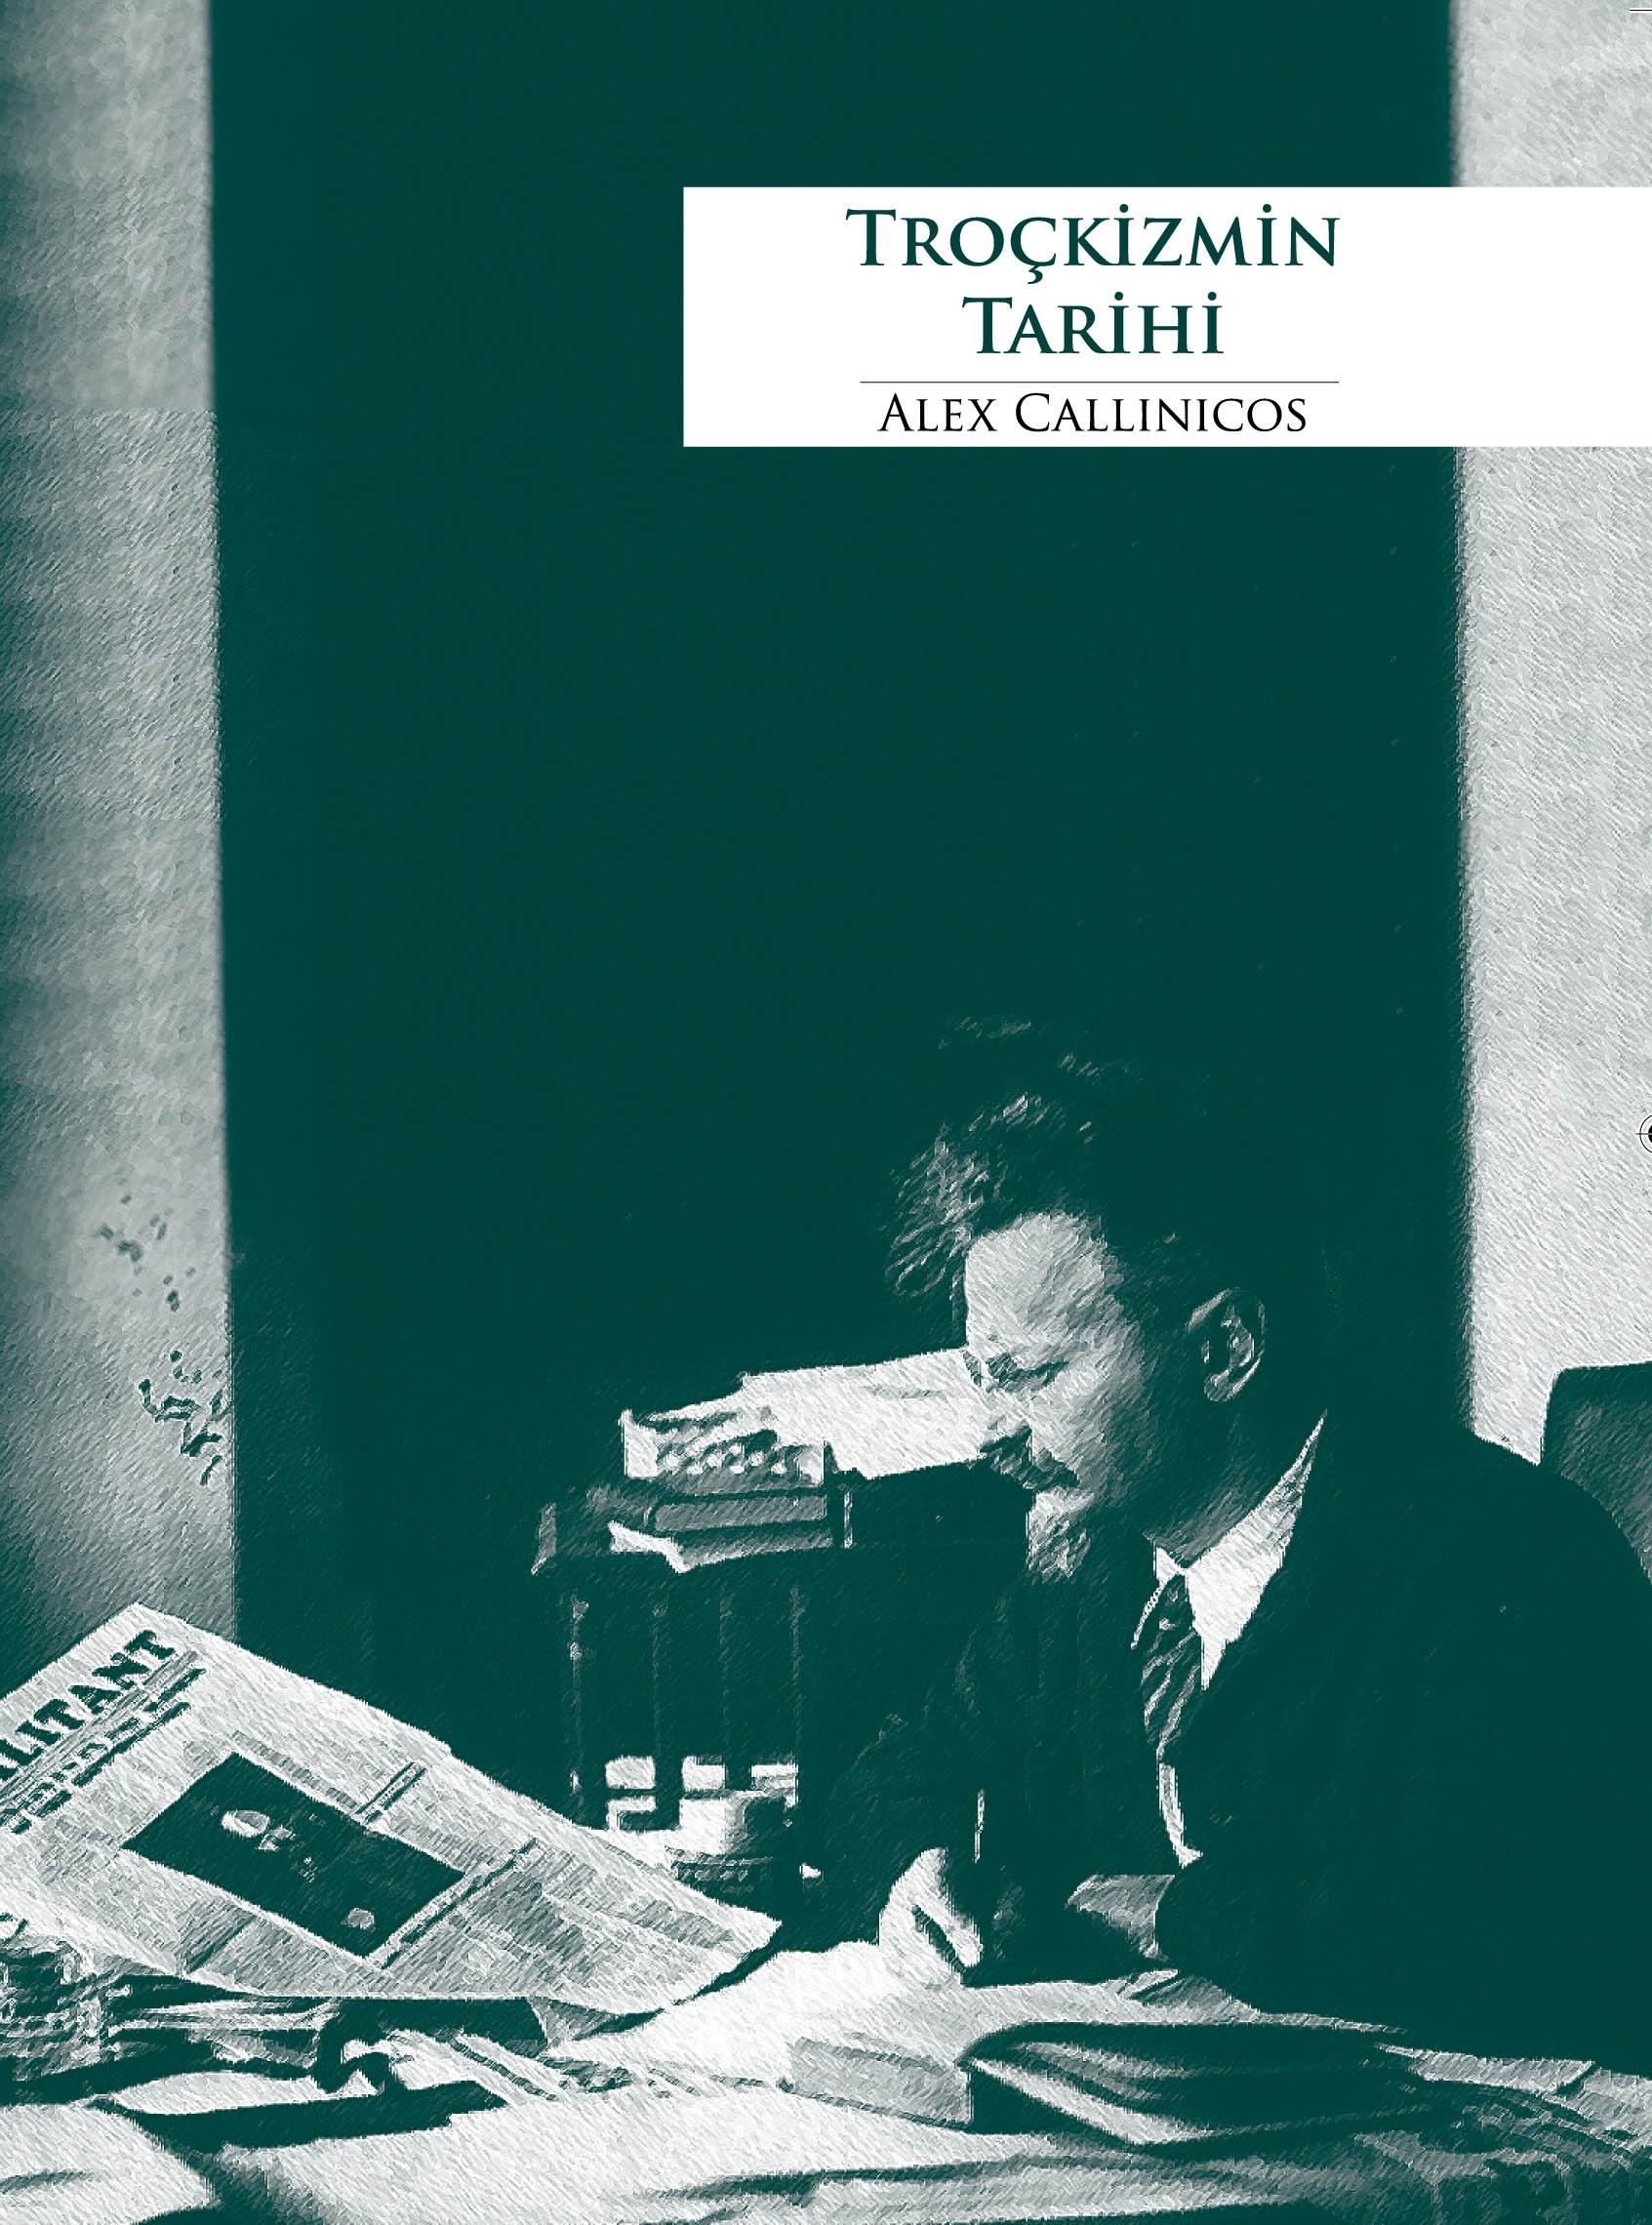 Ivan Ivanovich Kozlov: biyografi ve edebi etkinlik 96